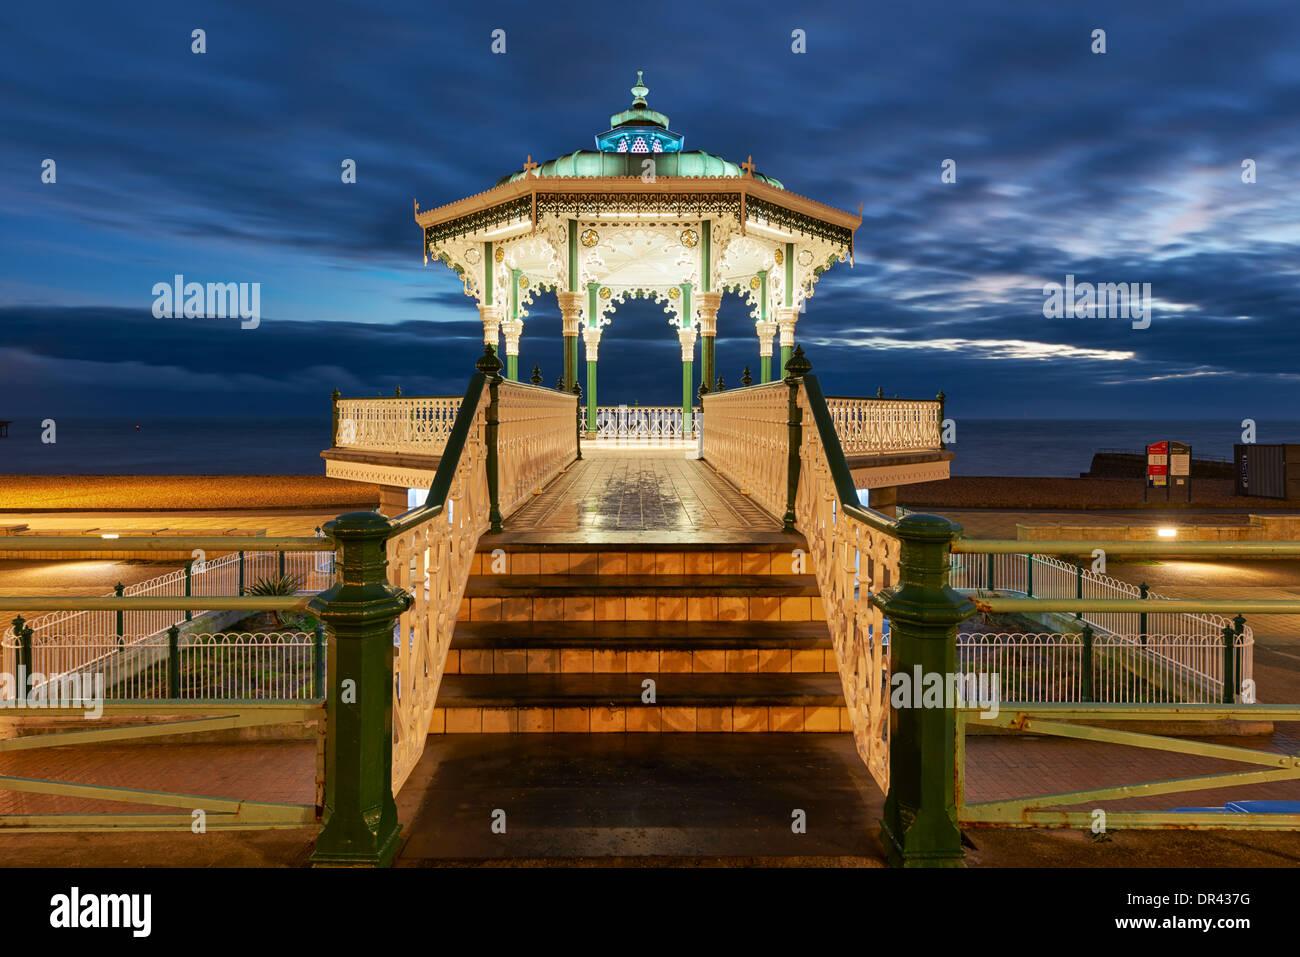 Brighton Musikpavillon beleuchtet in der Dämmerung Stockbild